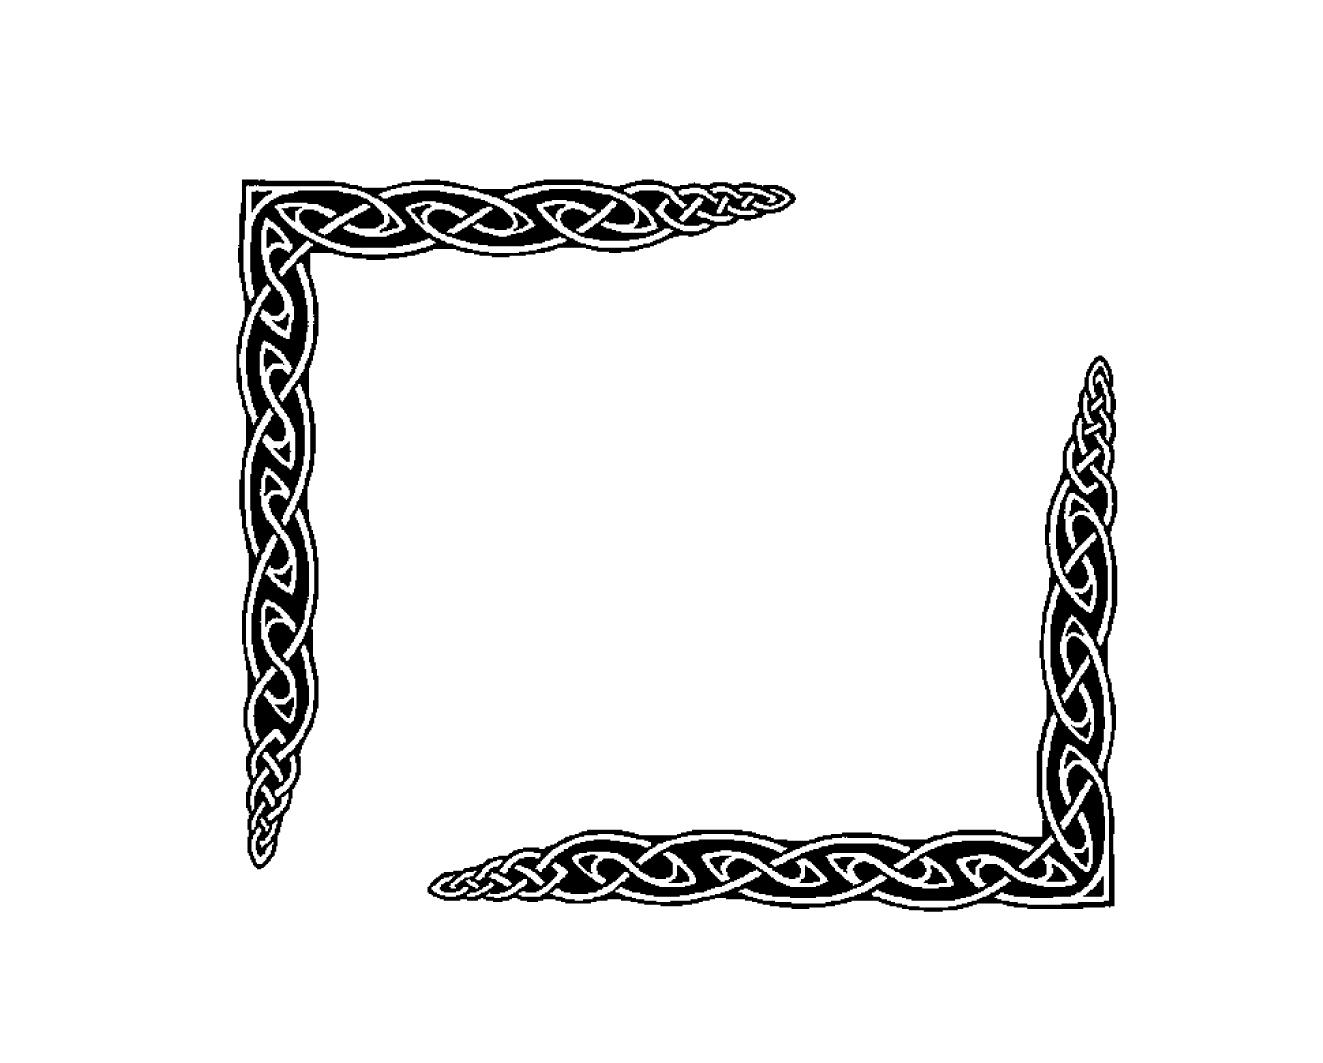 Celt clipart frame corner Corner Knot Celtic border Clip